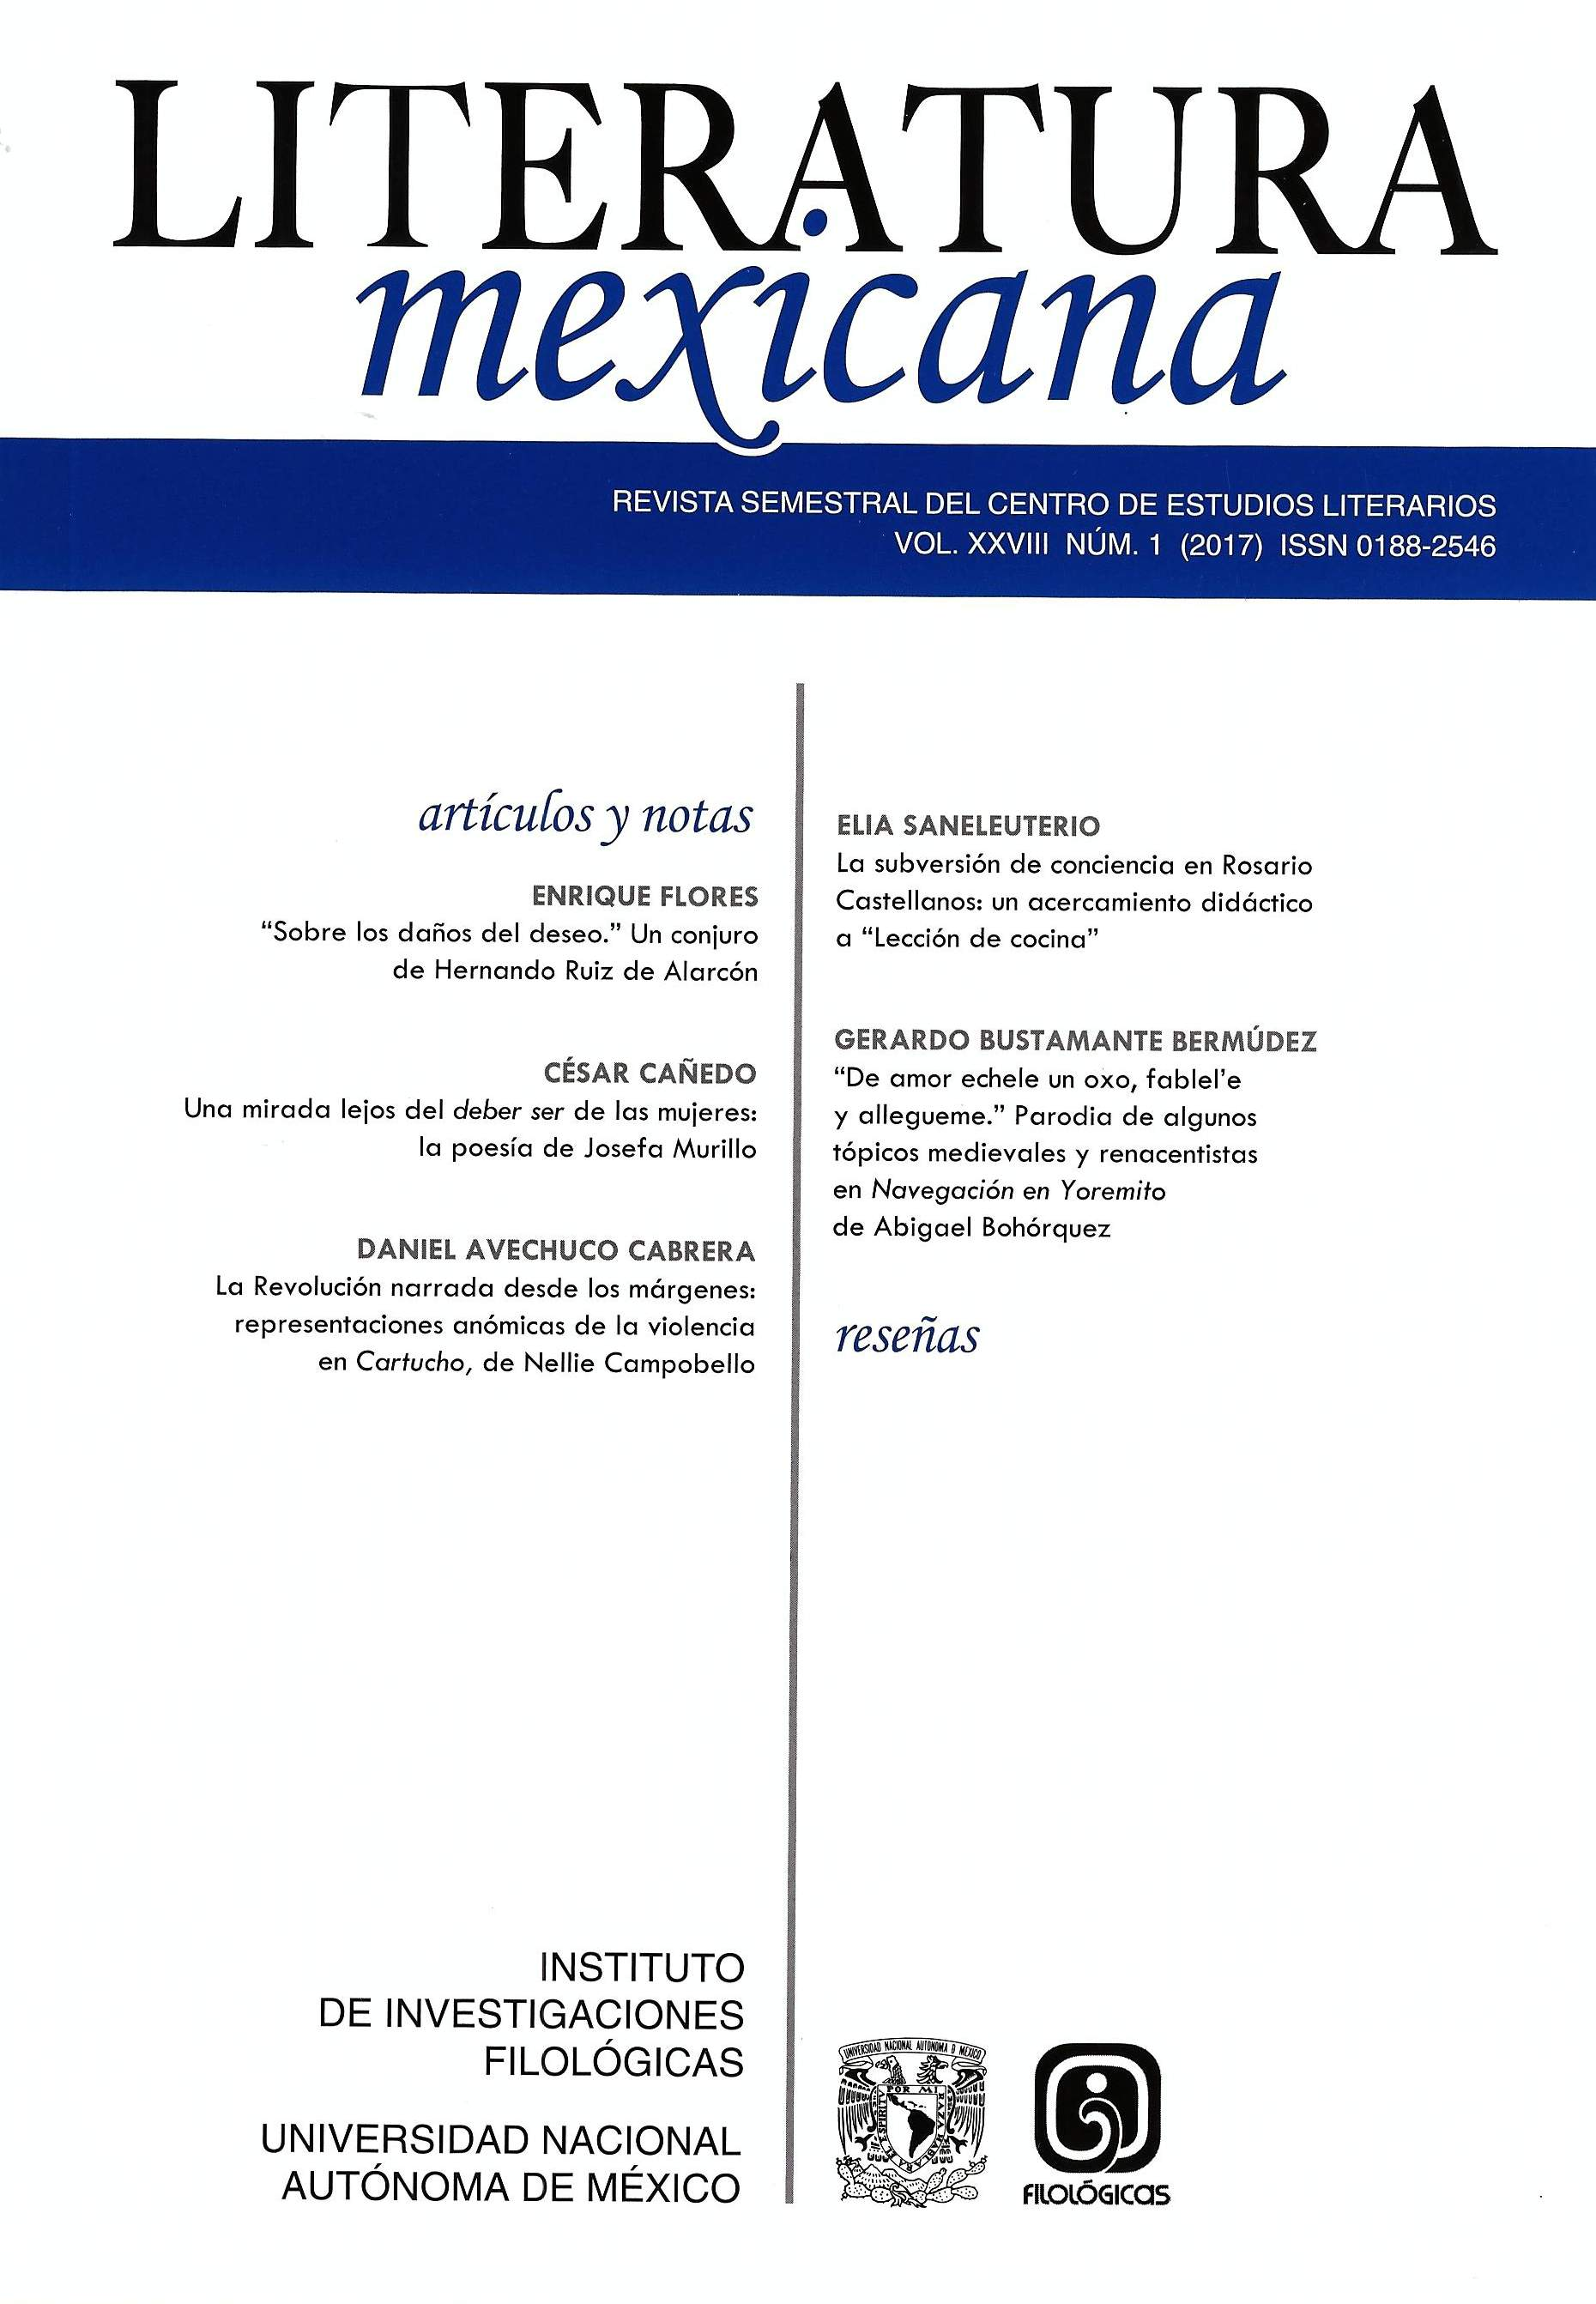 Literatura mexicana, vol. XXVIII, núm. 1 (2017)